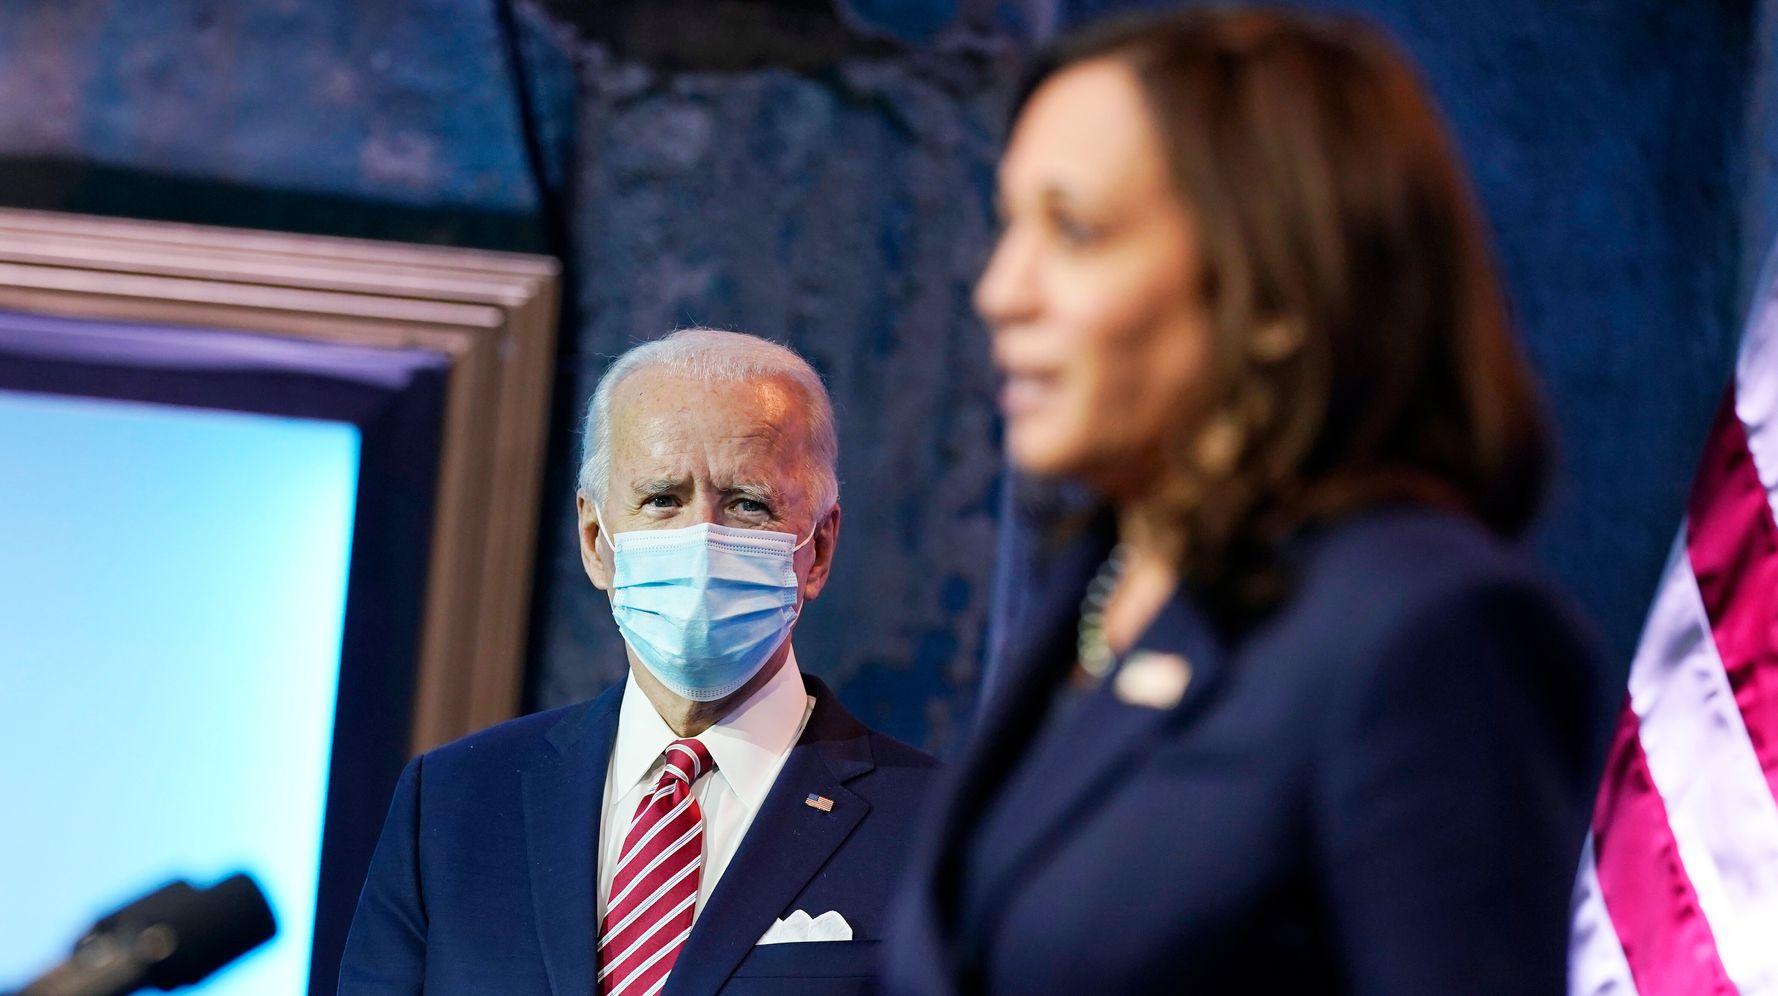 Joe Biden Gets Modestly Positive Initial Marks On Coronavirus